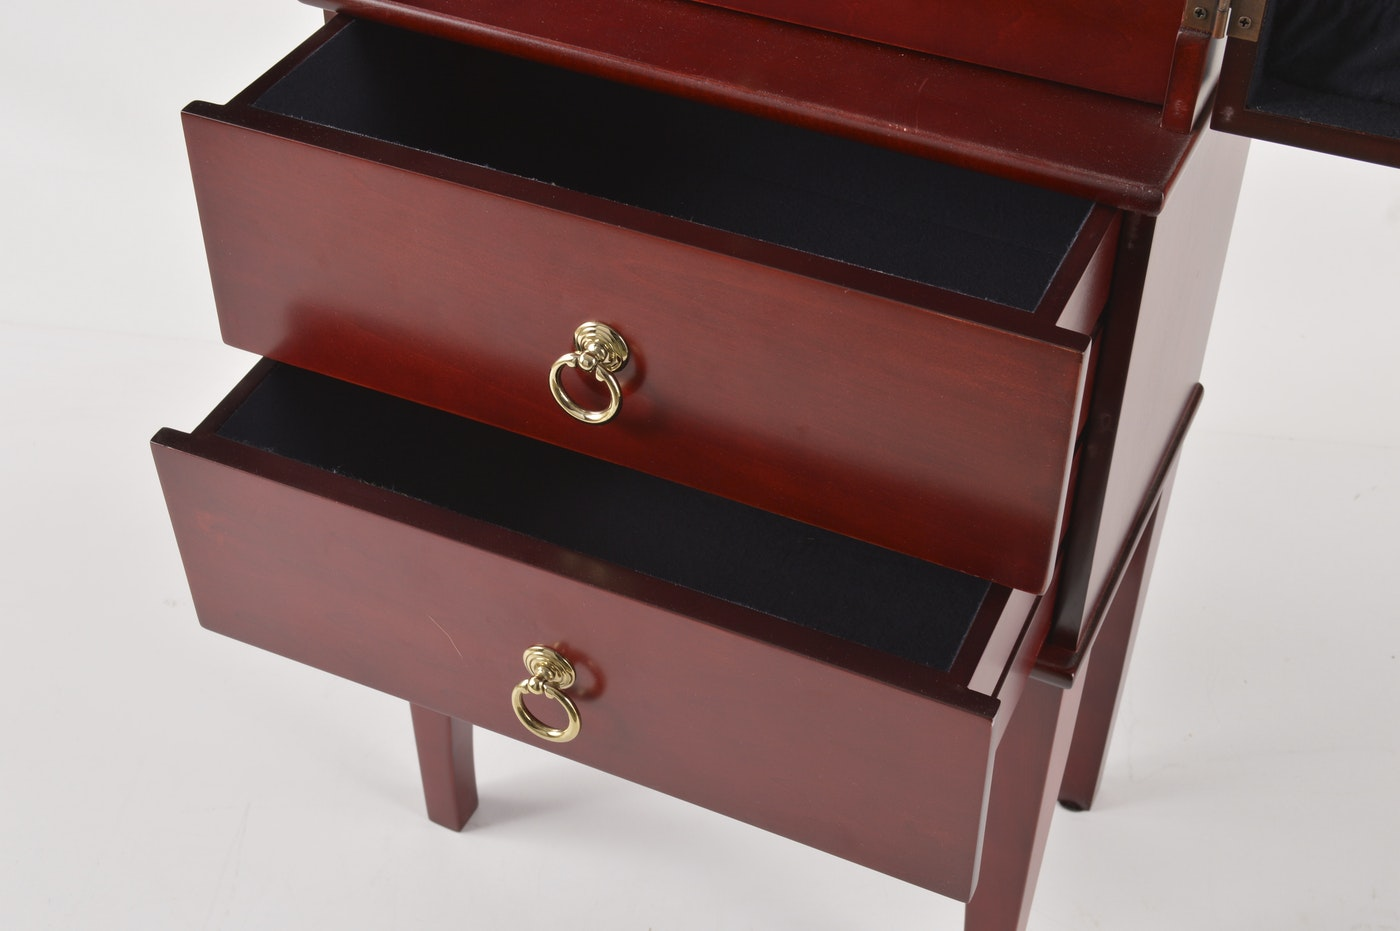 Jewelry Armoire From Lori Greiner   EBTH